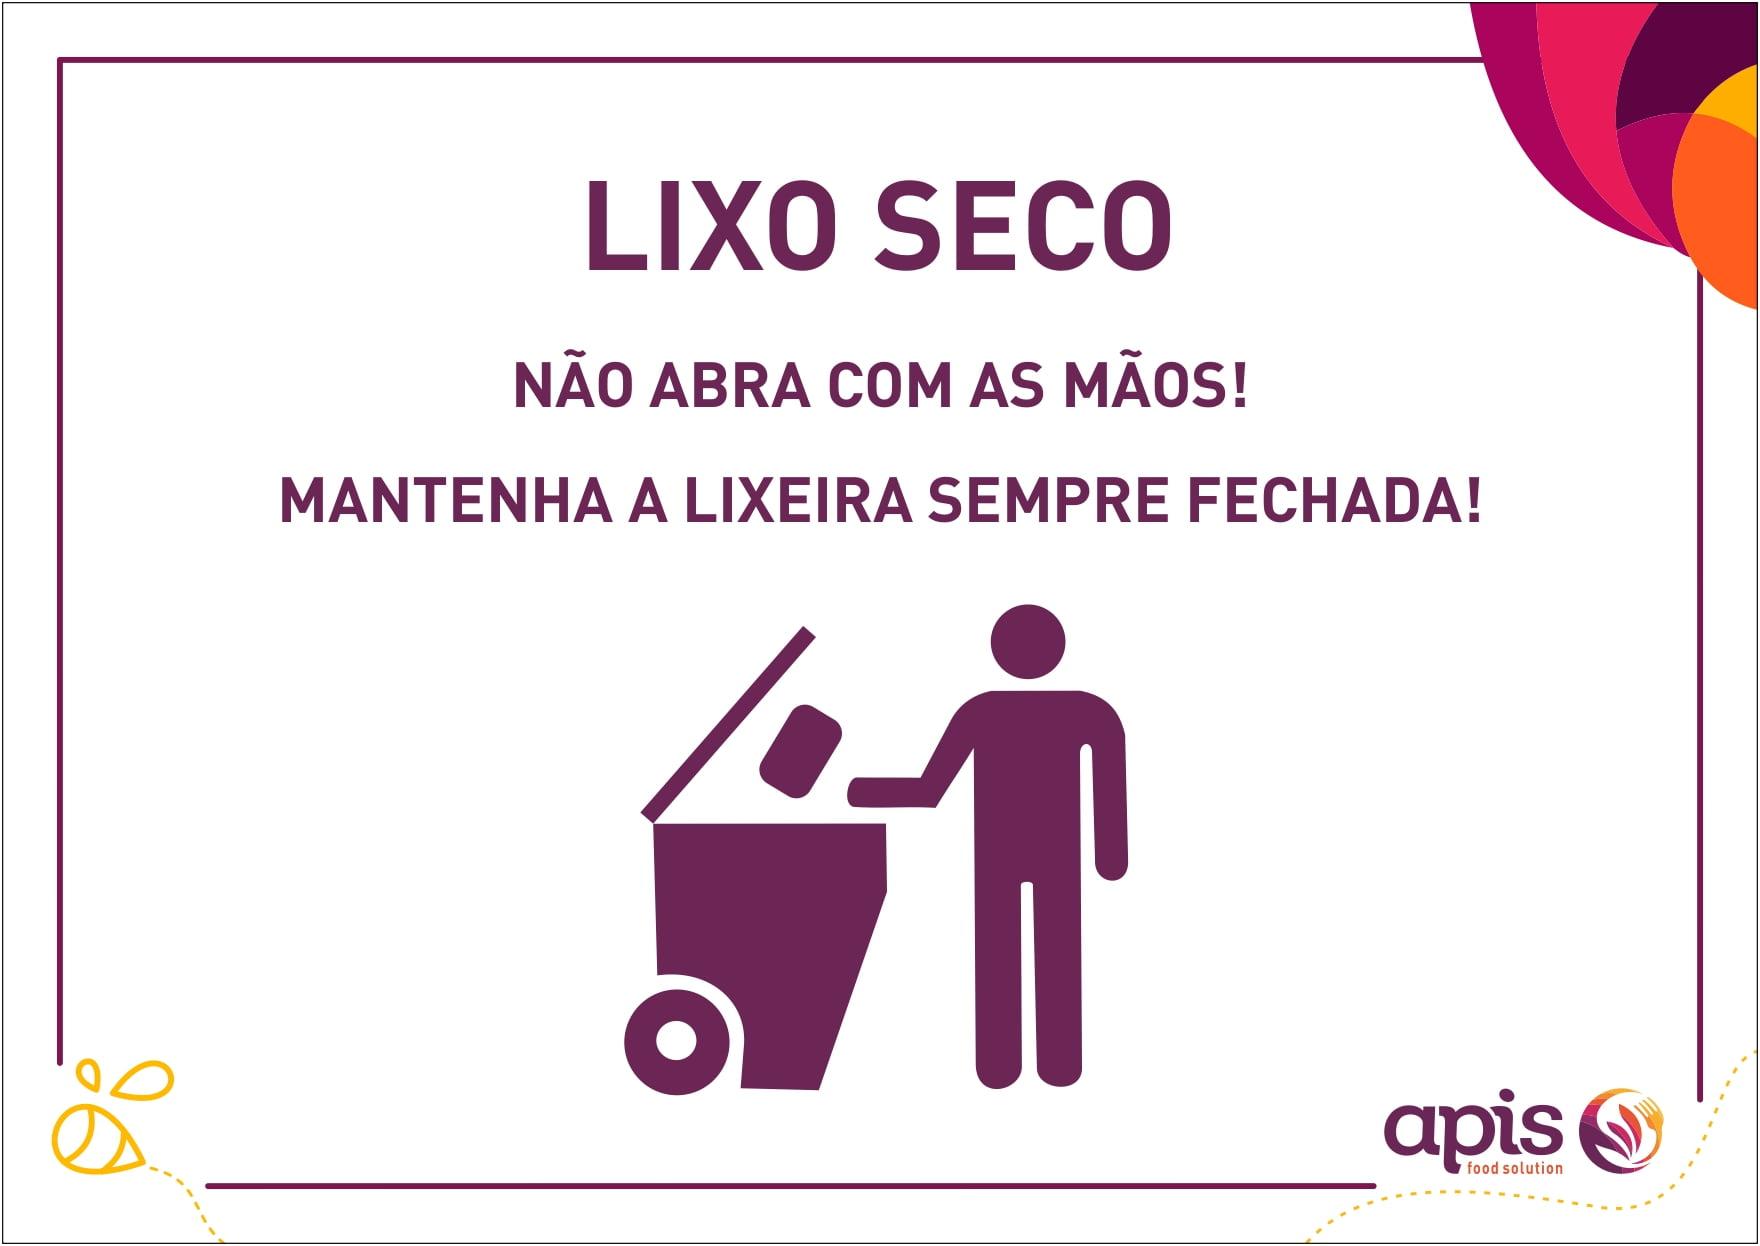 Lixo Seco